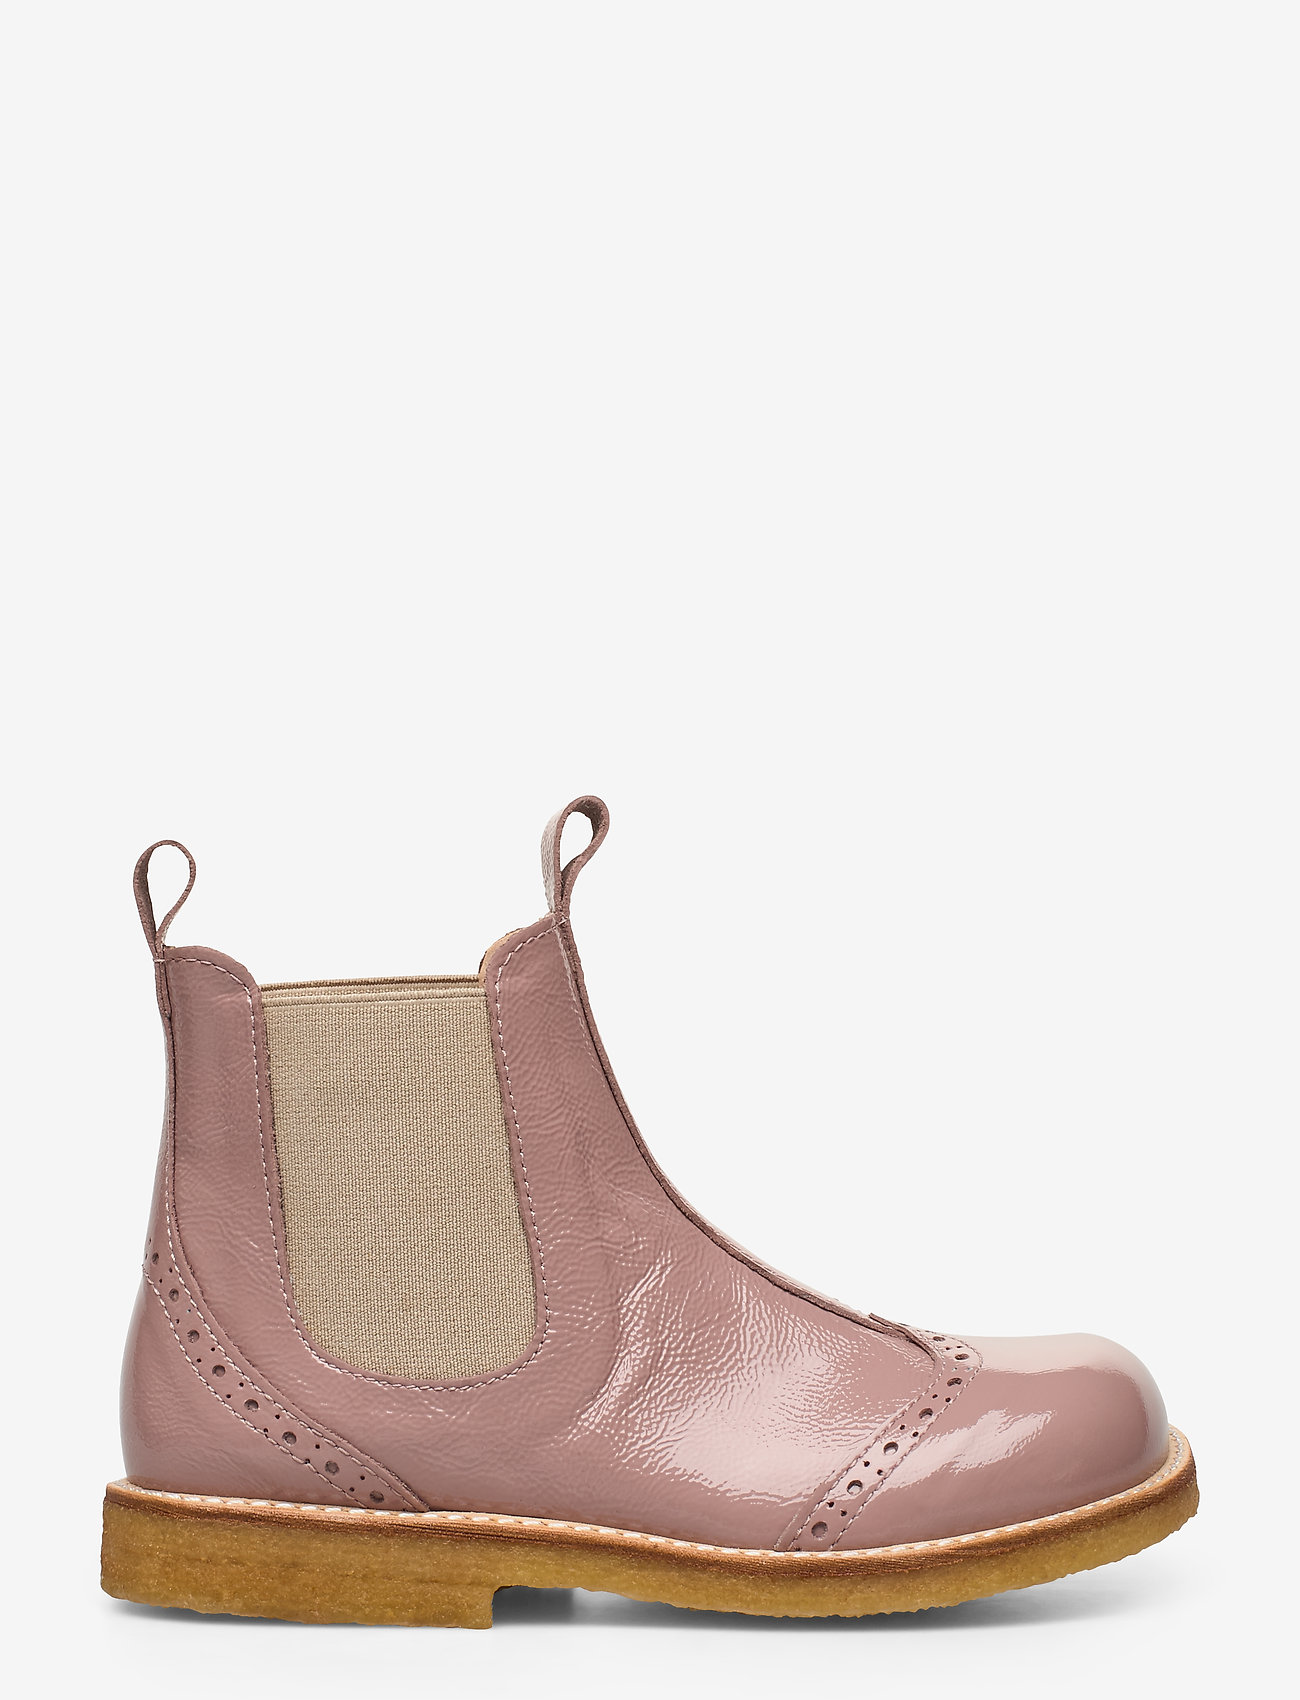 ANGULUS - Booties - flat - with elastic - stövlar & kängor - 1387/010 patent powder/beige - 1